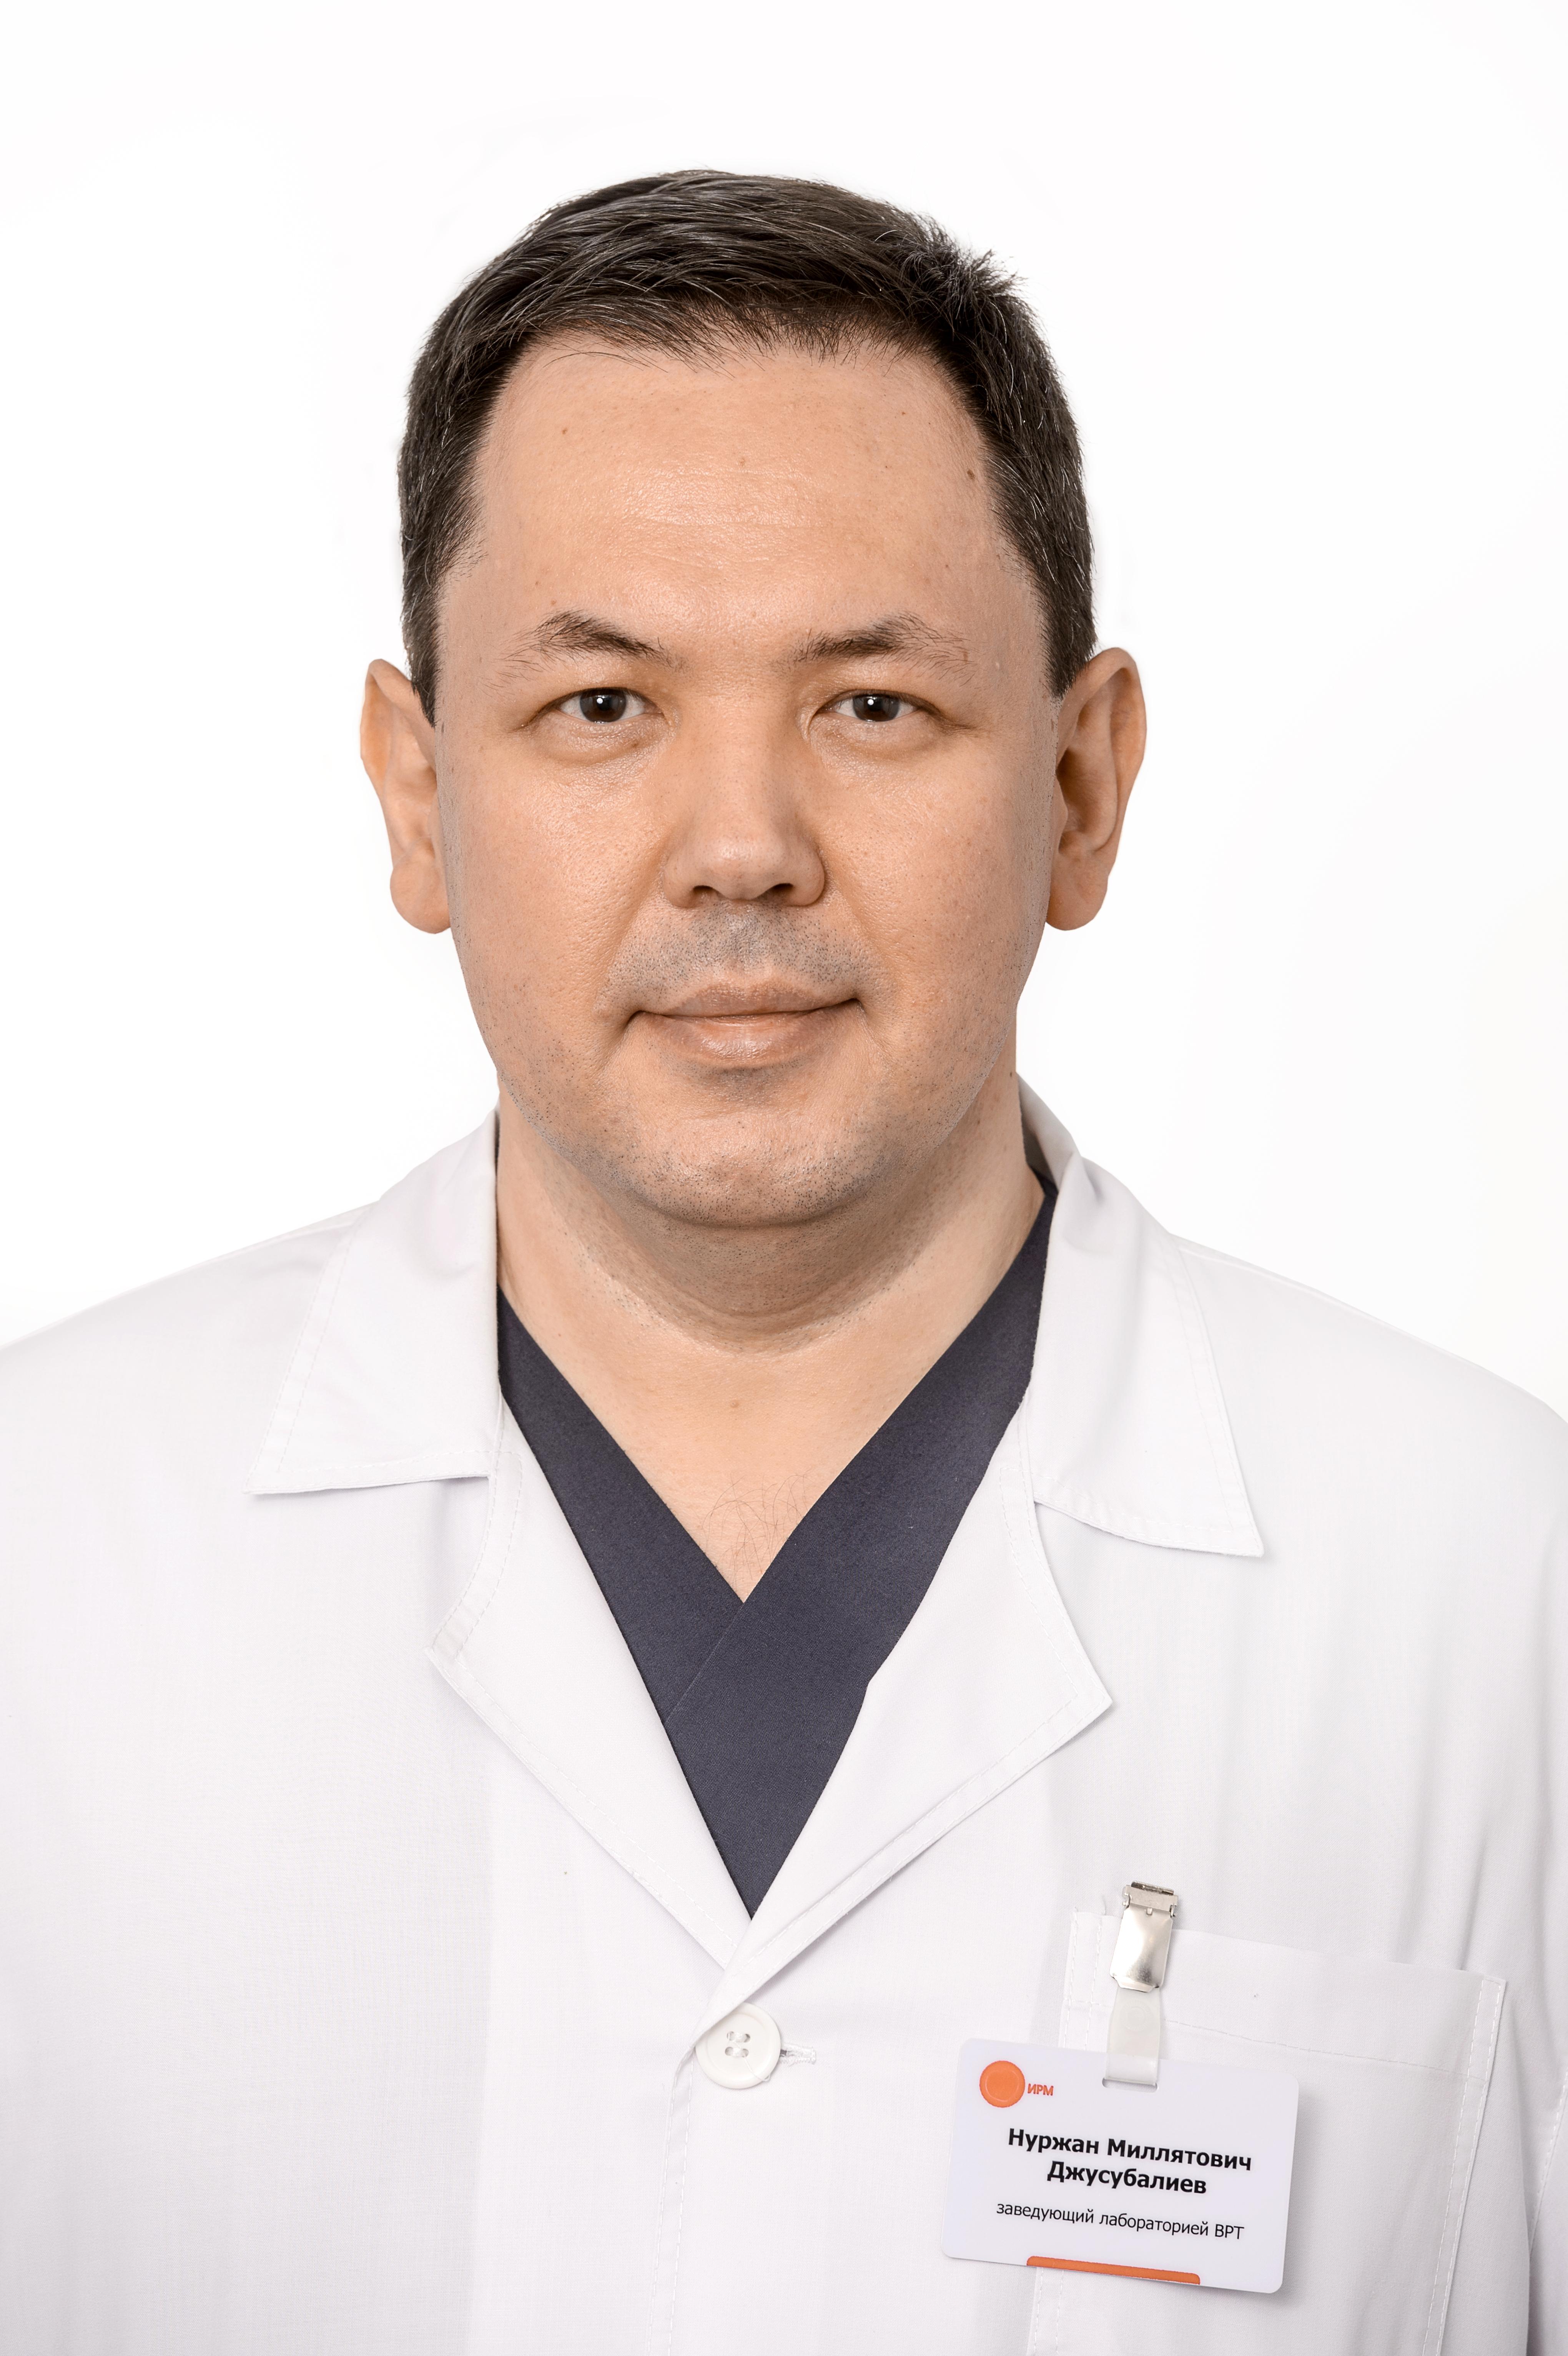 Джусубалиев Нуржан Миллятович фото